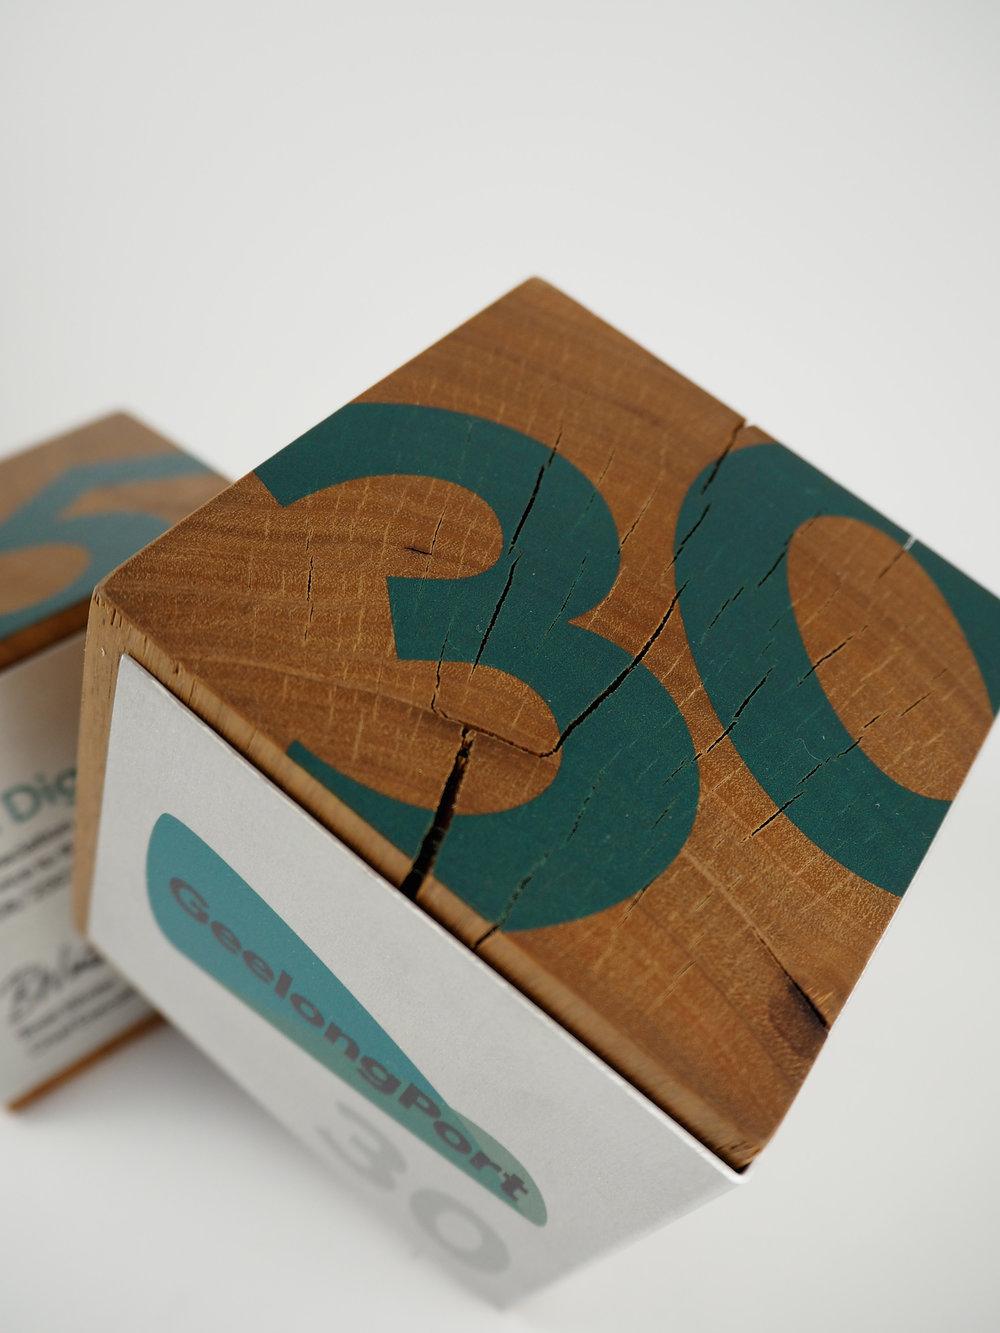 geelong-port-awards-reclaimed-timber-eco-aluminium-trophy-04.jpg